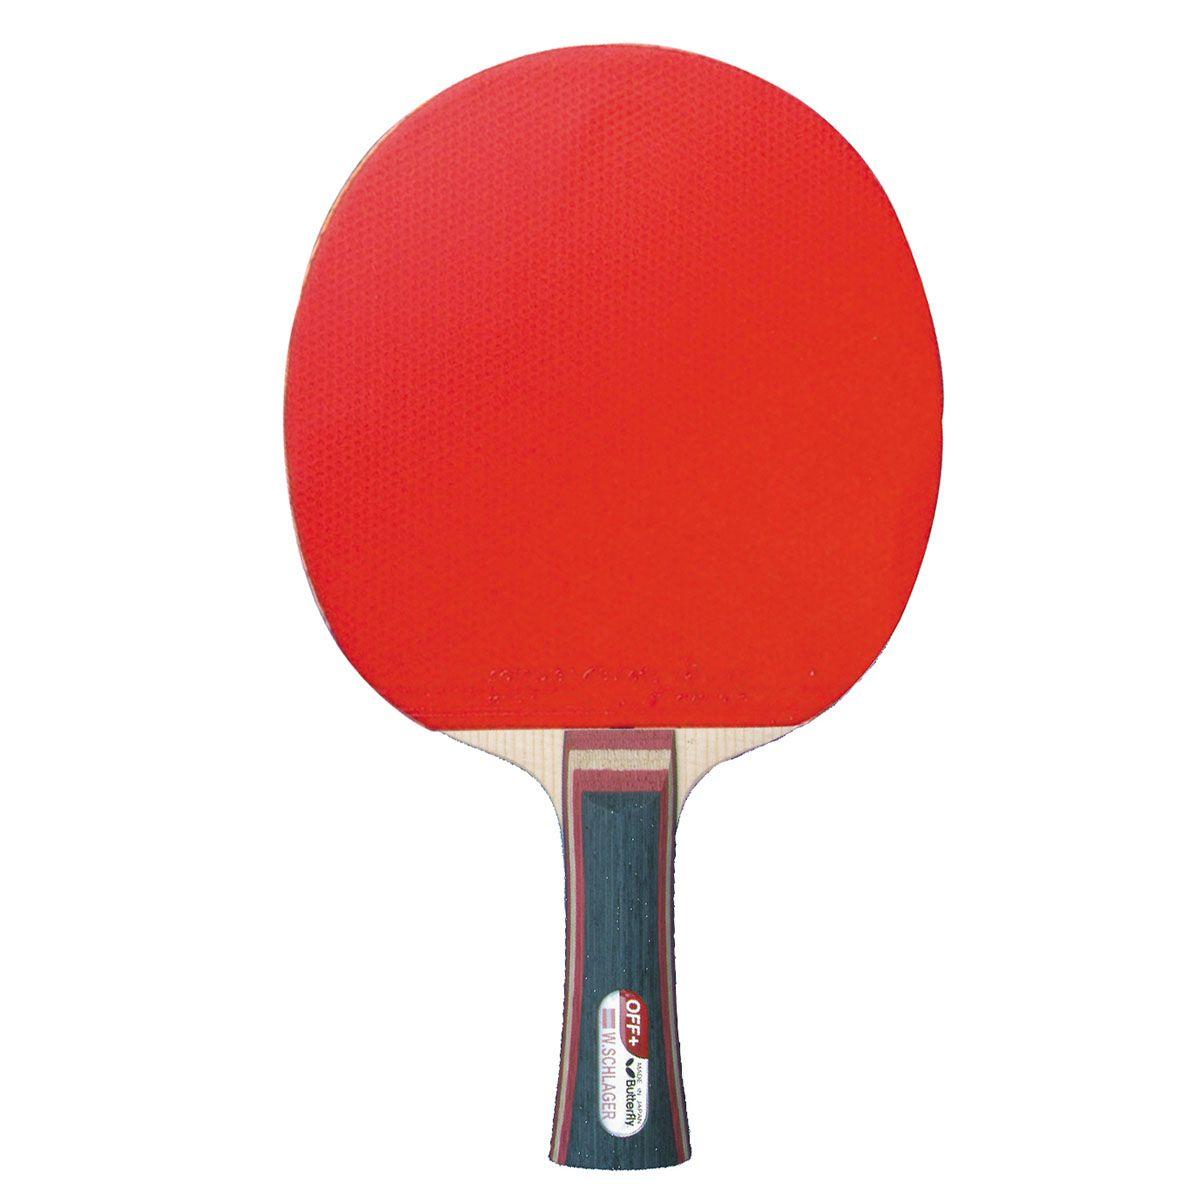 Impressive Butterfly Table Tennis 1200 x 1200 · 73 kB · jpeg